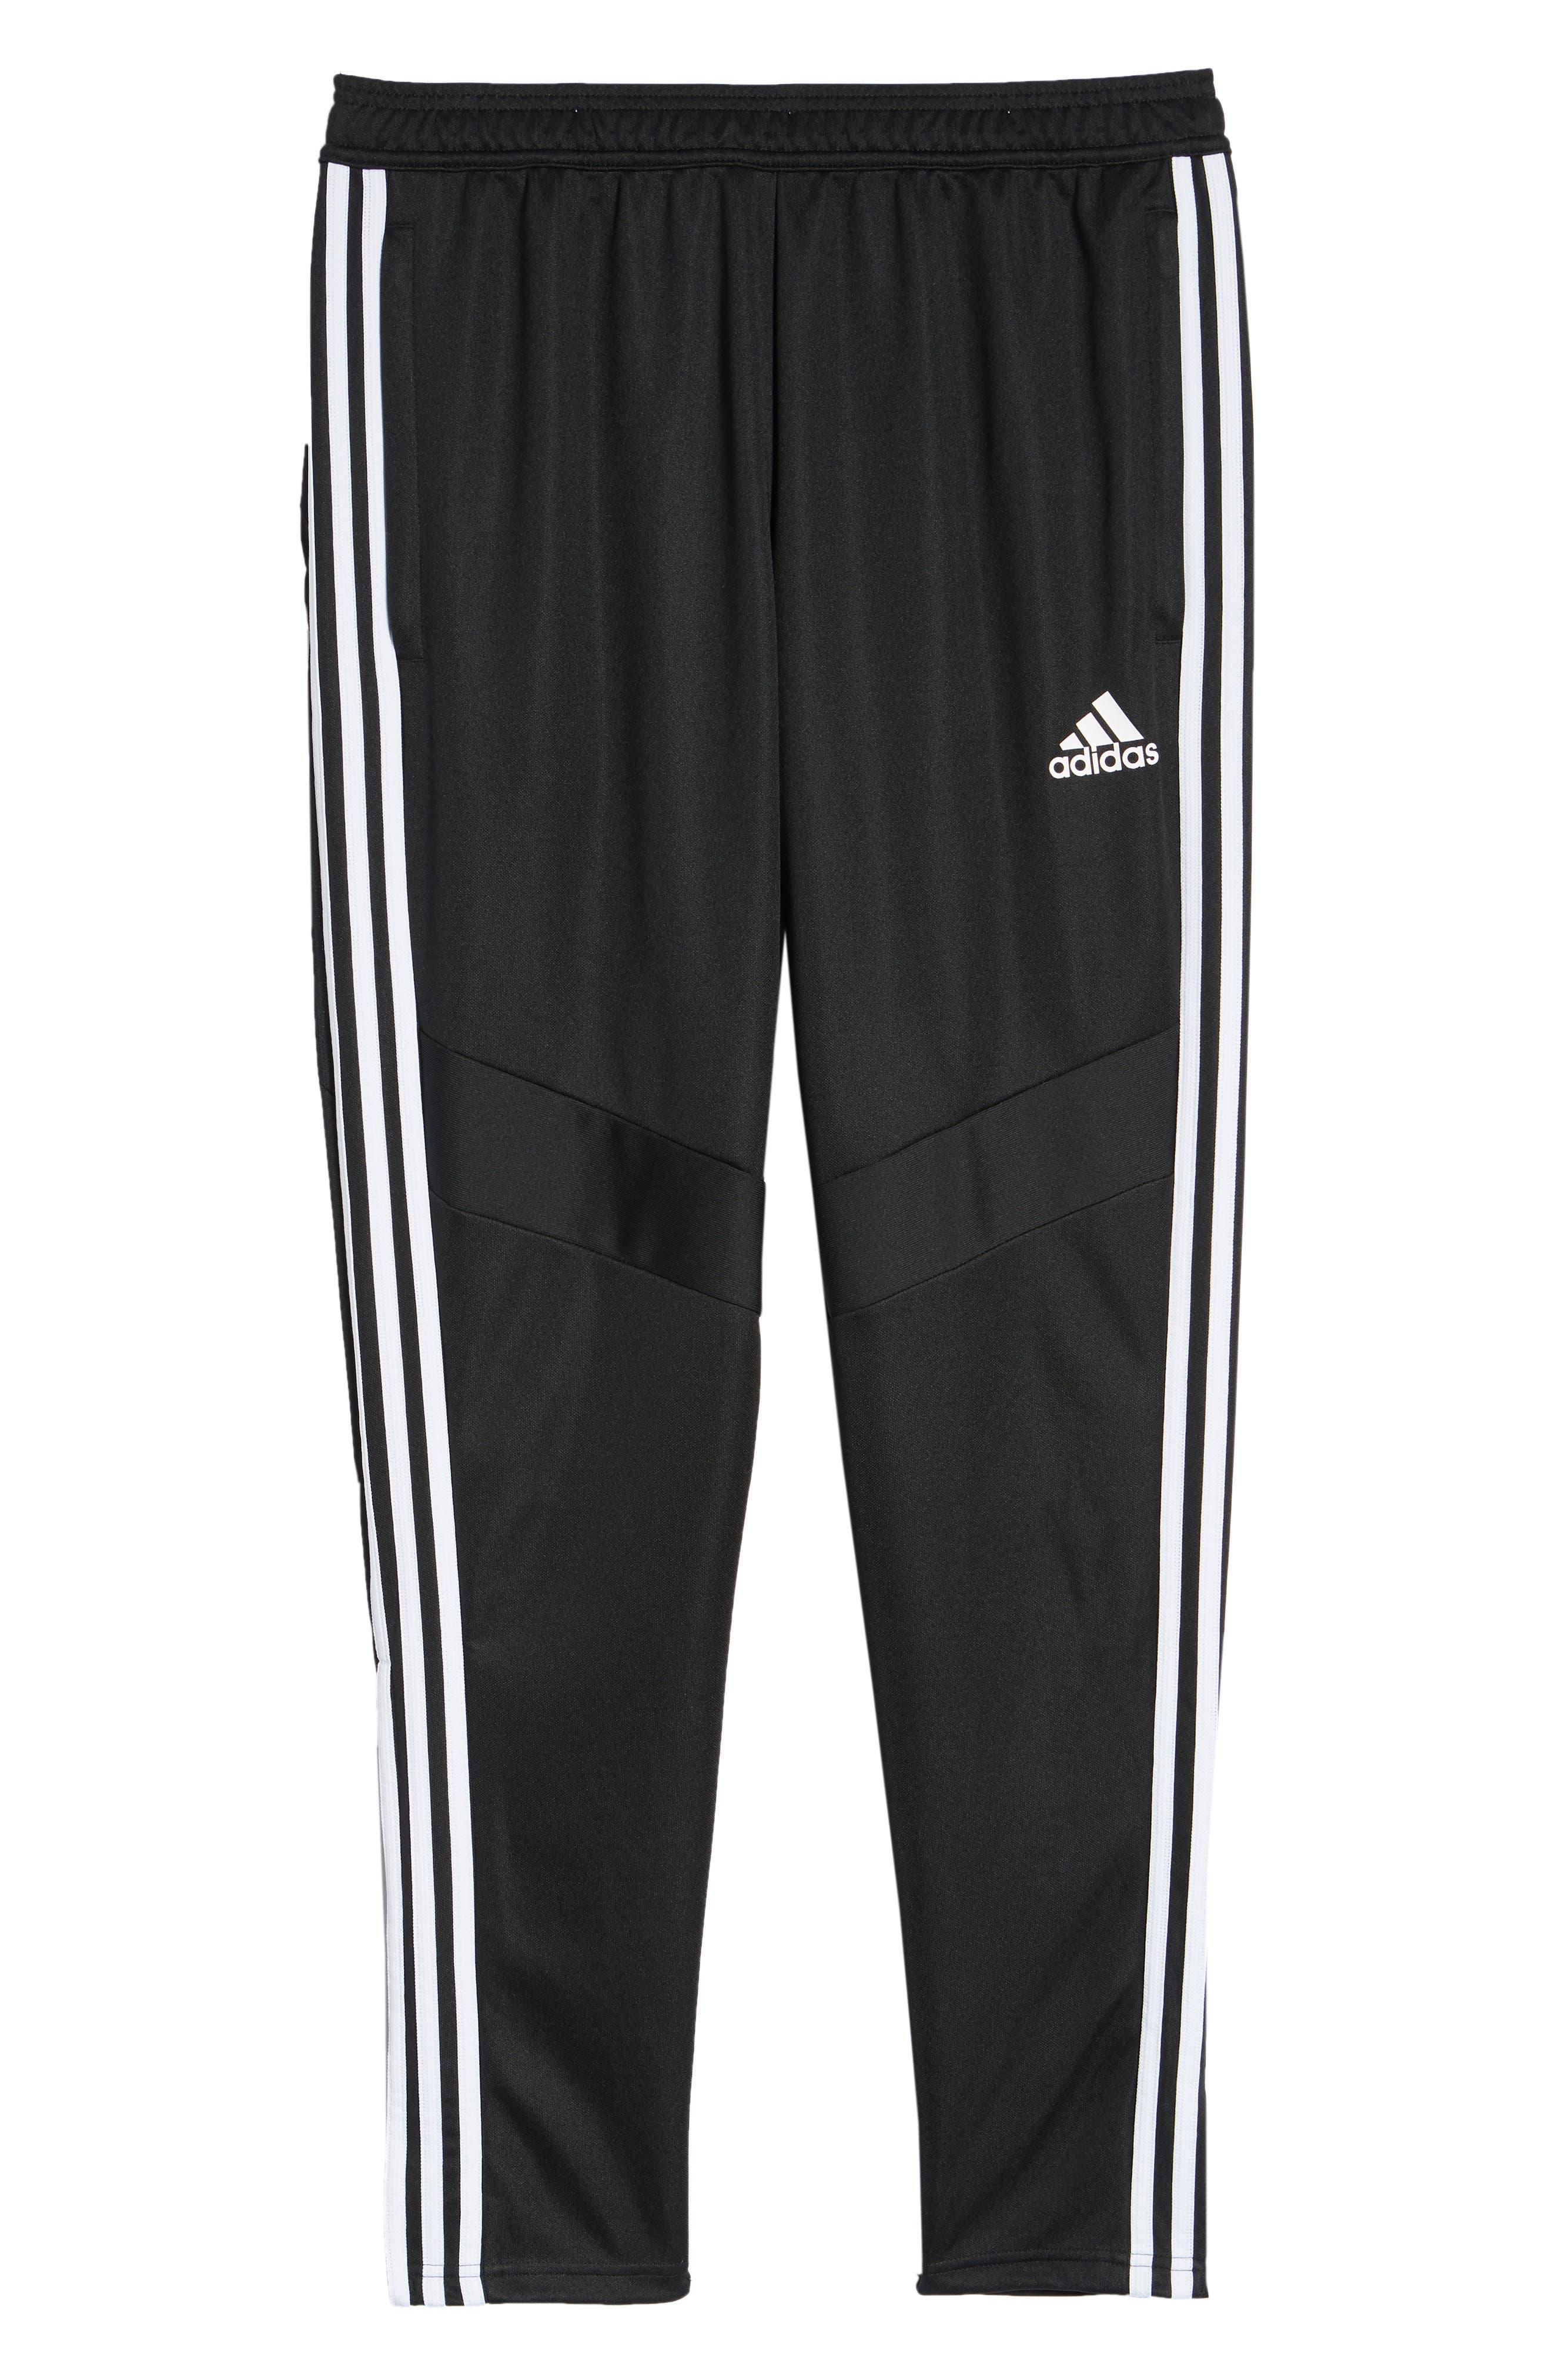 ,                             Tiro Soccer Training Pants,                             Alternate thumbnail 7, color,                             BLACK/ WHITE